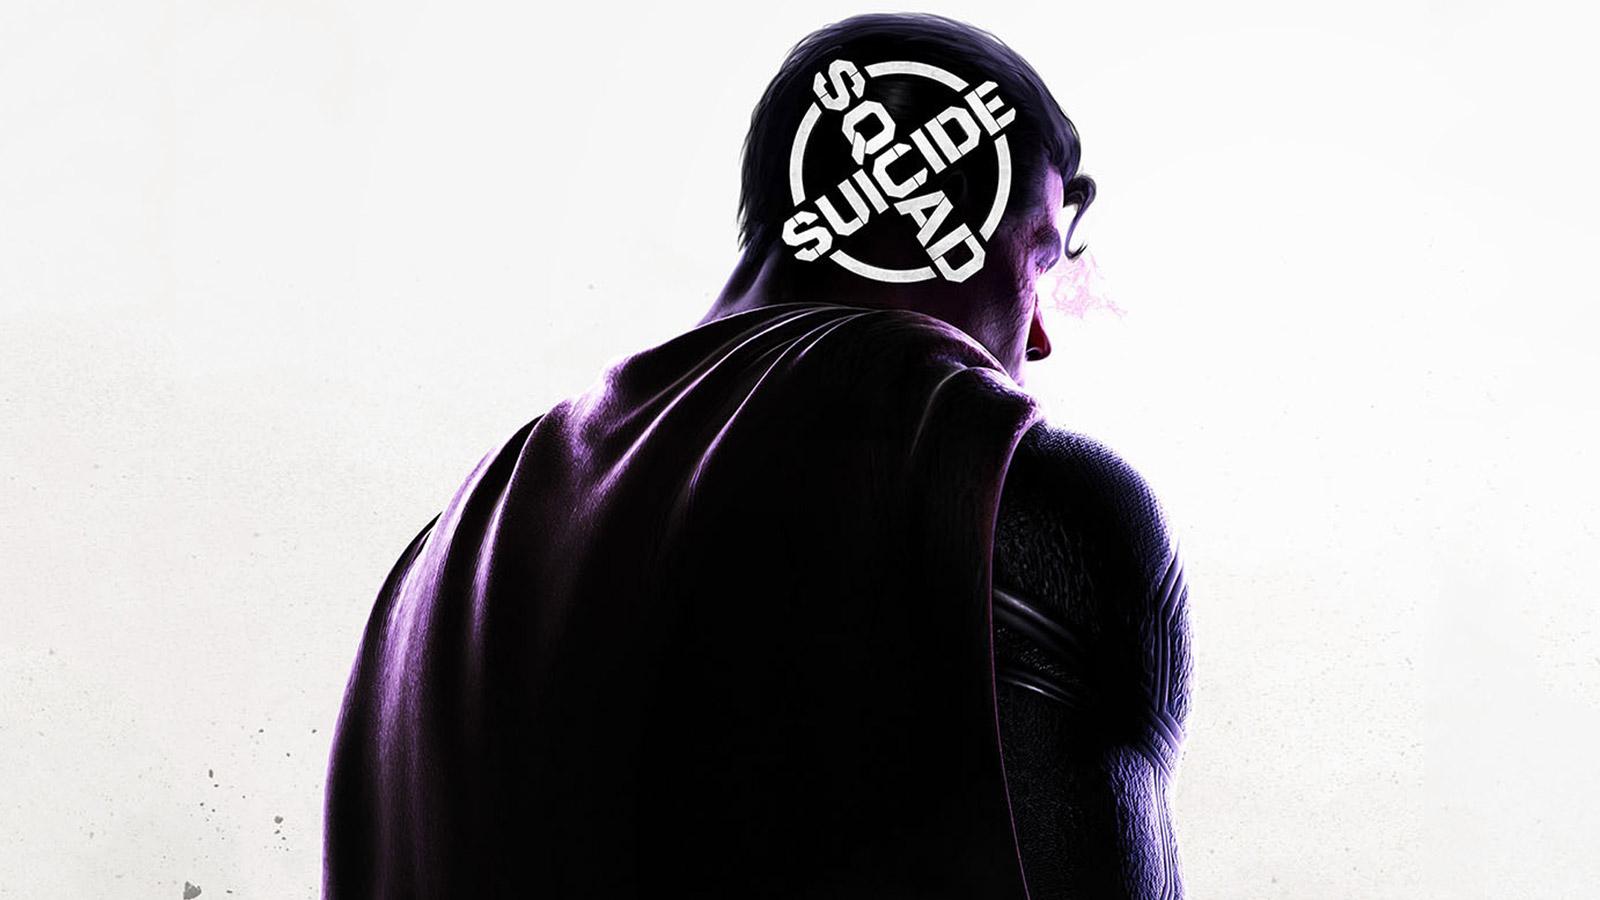 Free Suicide Squad: Kill the Justice League Wallpaper in 1600x900